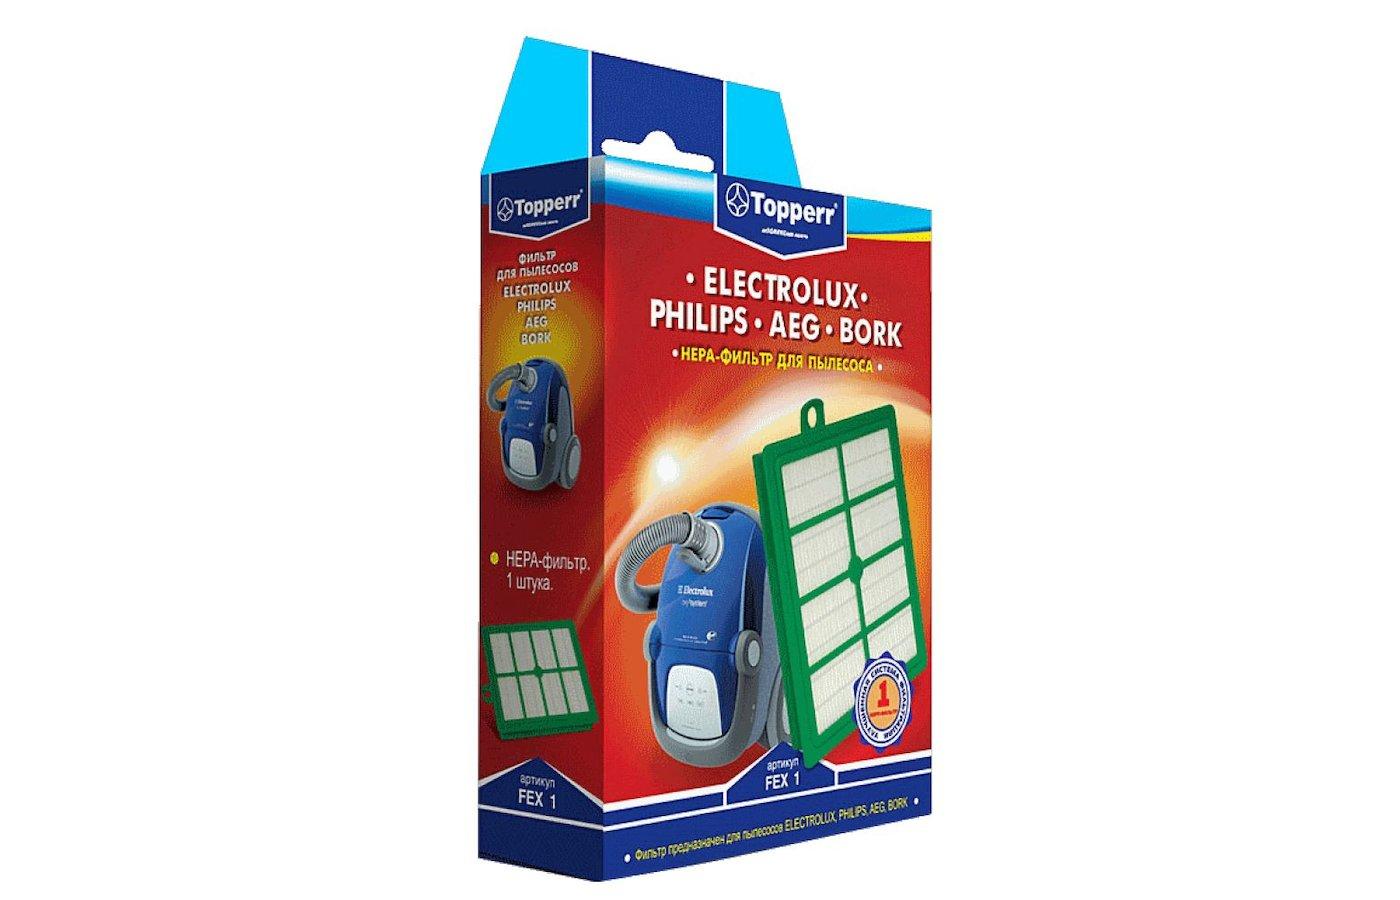 Фильтр для пылесоса TOPPERR 1104 FEX 1 Hepa Filter д/пылесоса Electrolux Philips H12 1 шт.в ед.